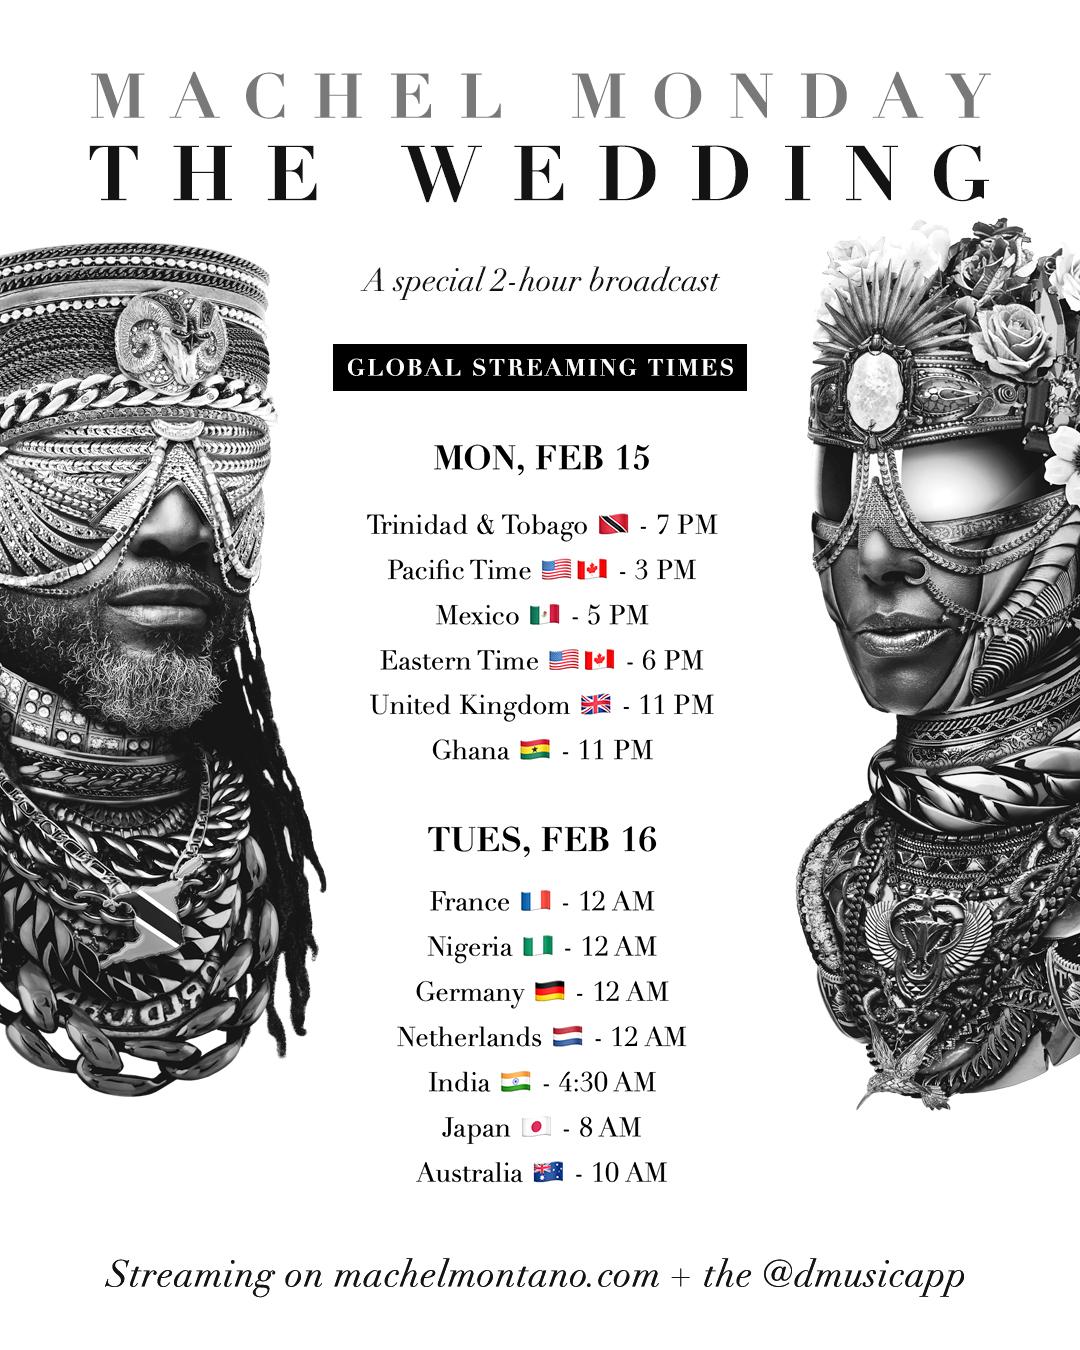 Machel Monday - The Wedding tune-in times